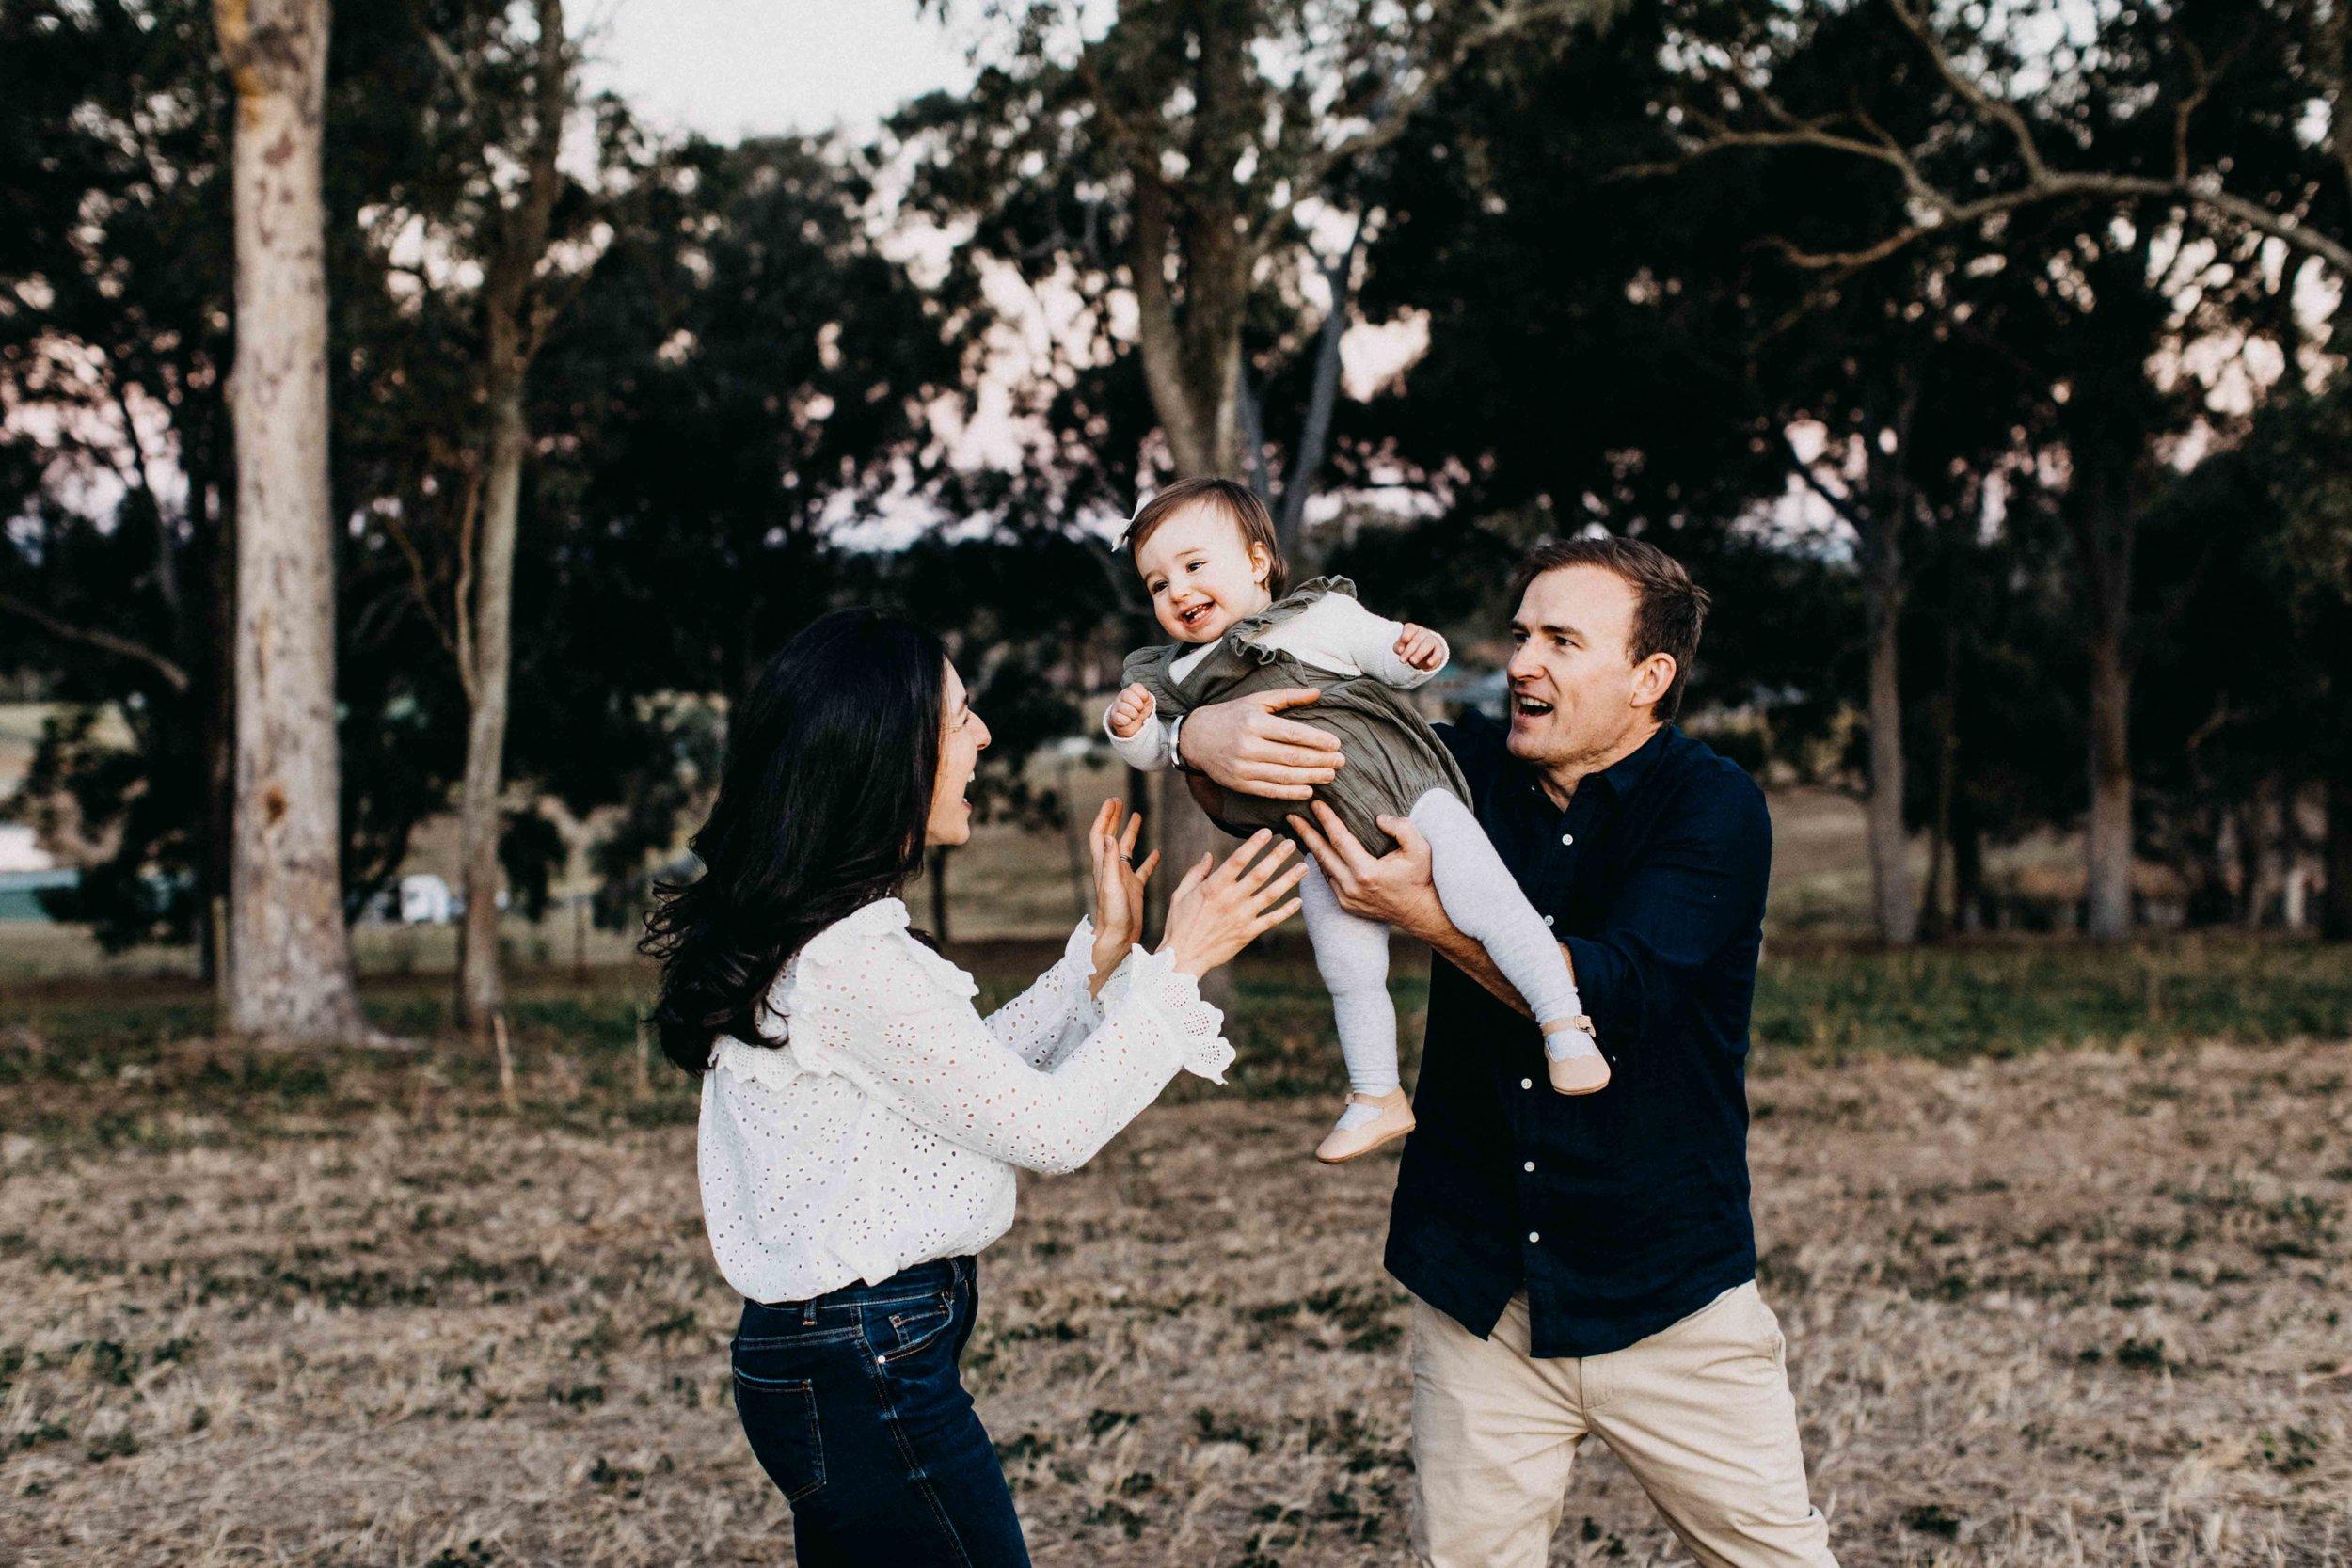 camden-family-photography-galea-www.emilyobrienphotography.net-44.jpg